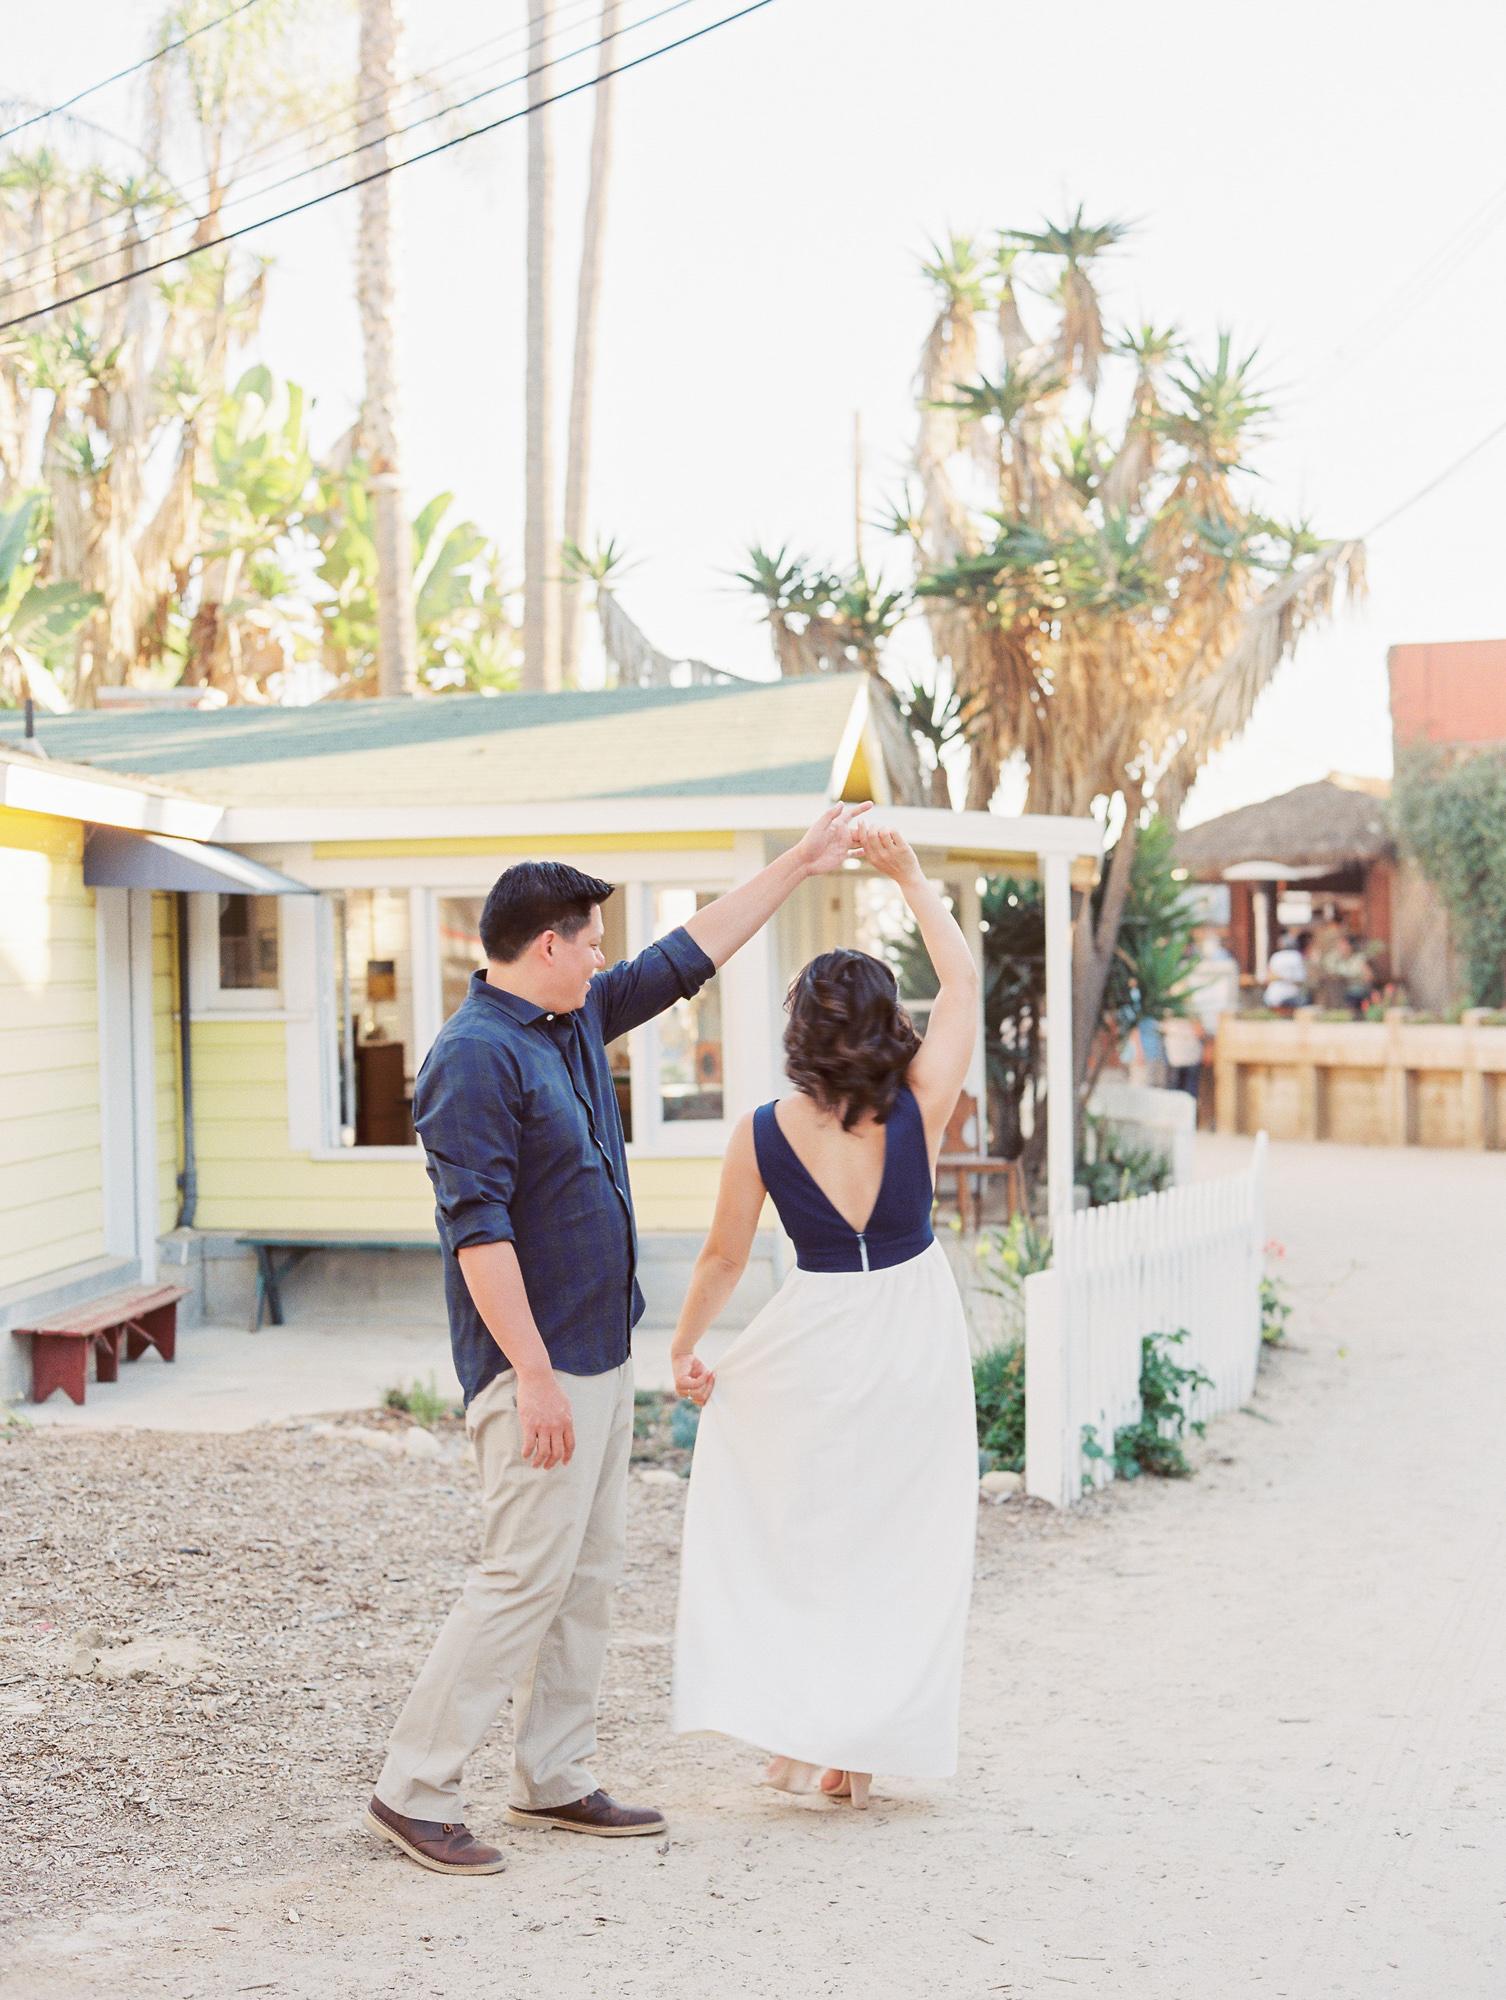 Crystal-Cove-Engagement-Kristina-Adams-10.jpg